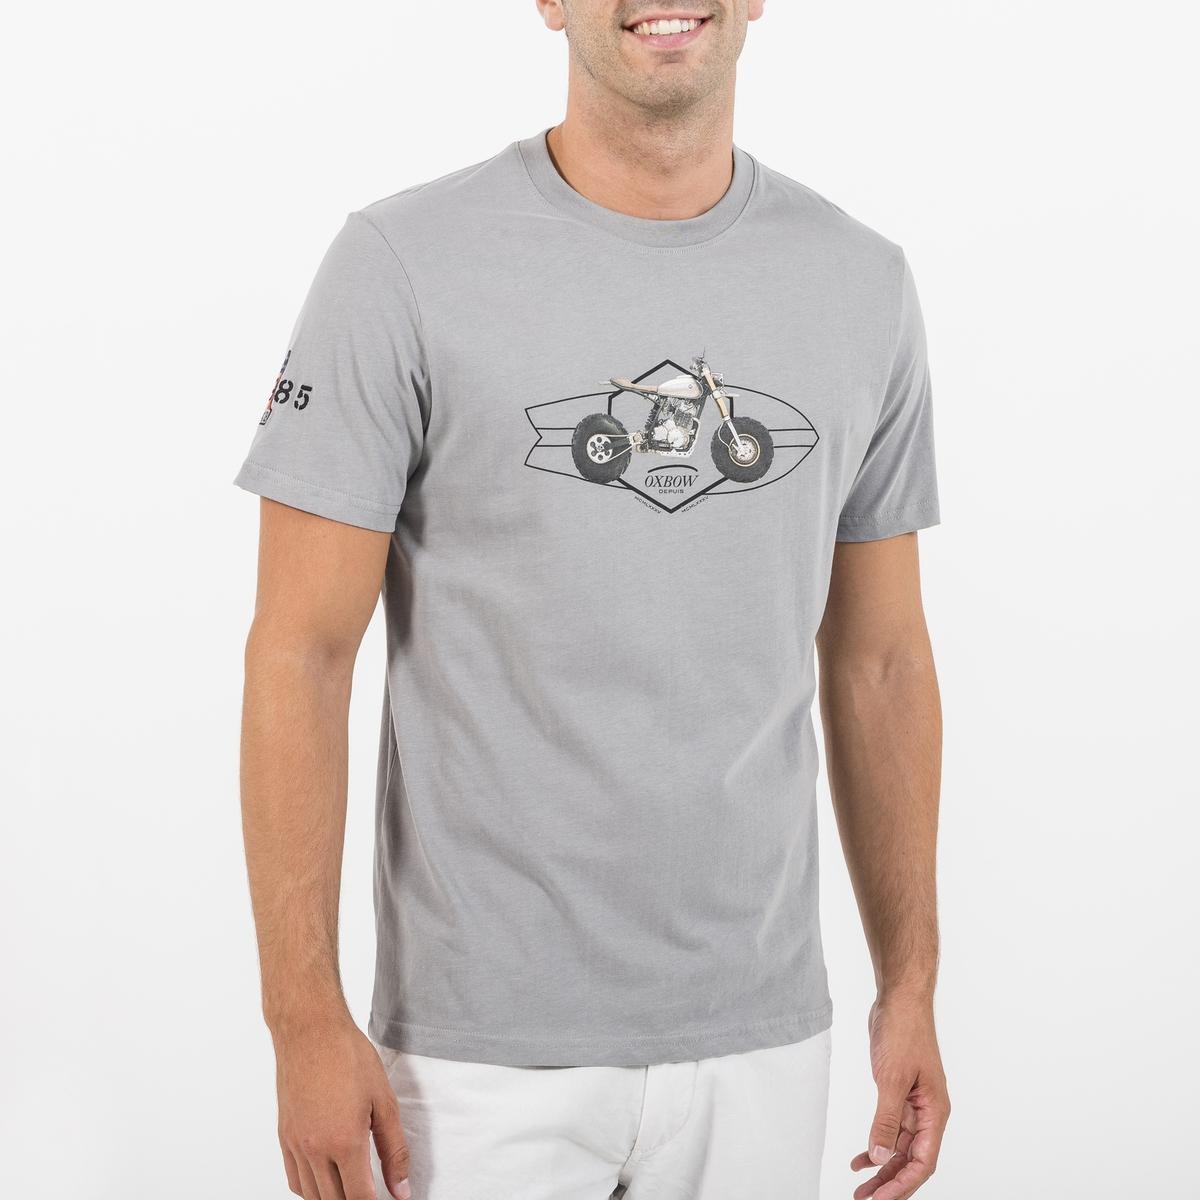 Футболка с круглым вырезом, короткими рукавами и рисунком спереди футболка с круглым вырезом и рисунком спереди